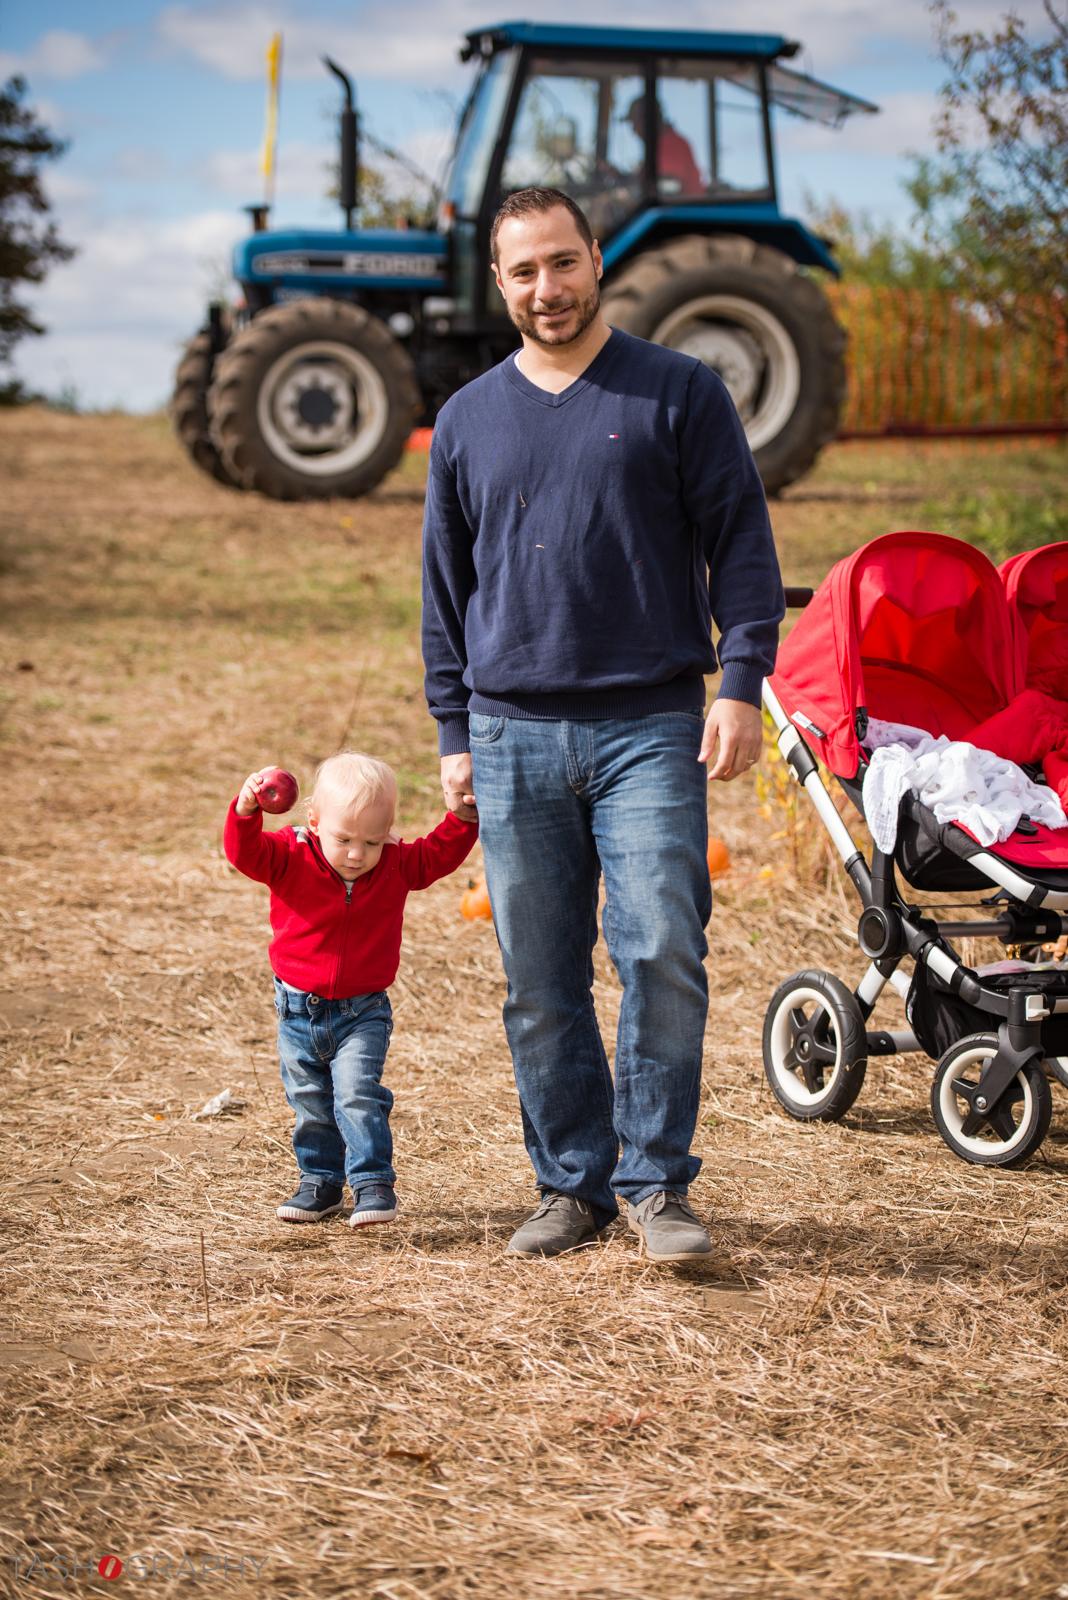 Family-Portraits-Stamford-2-15.jpg